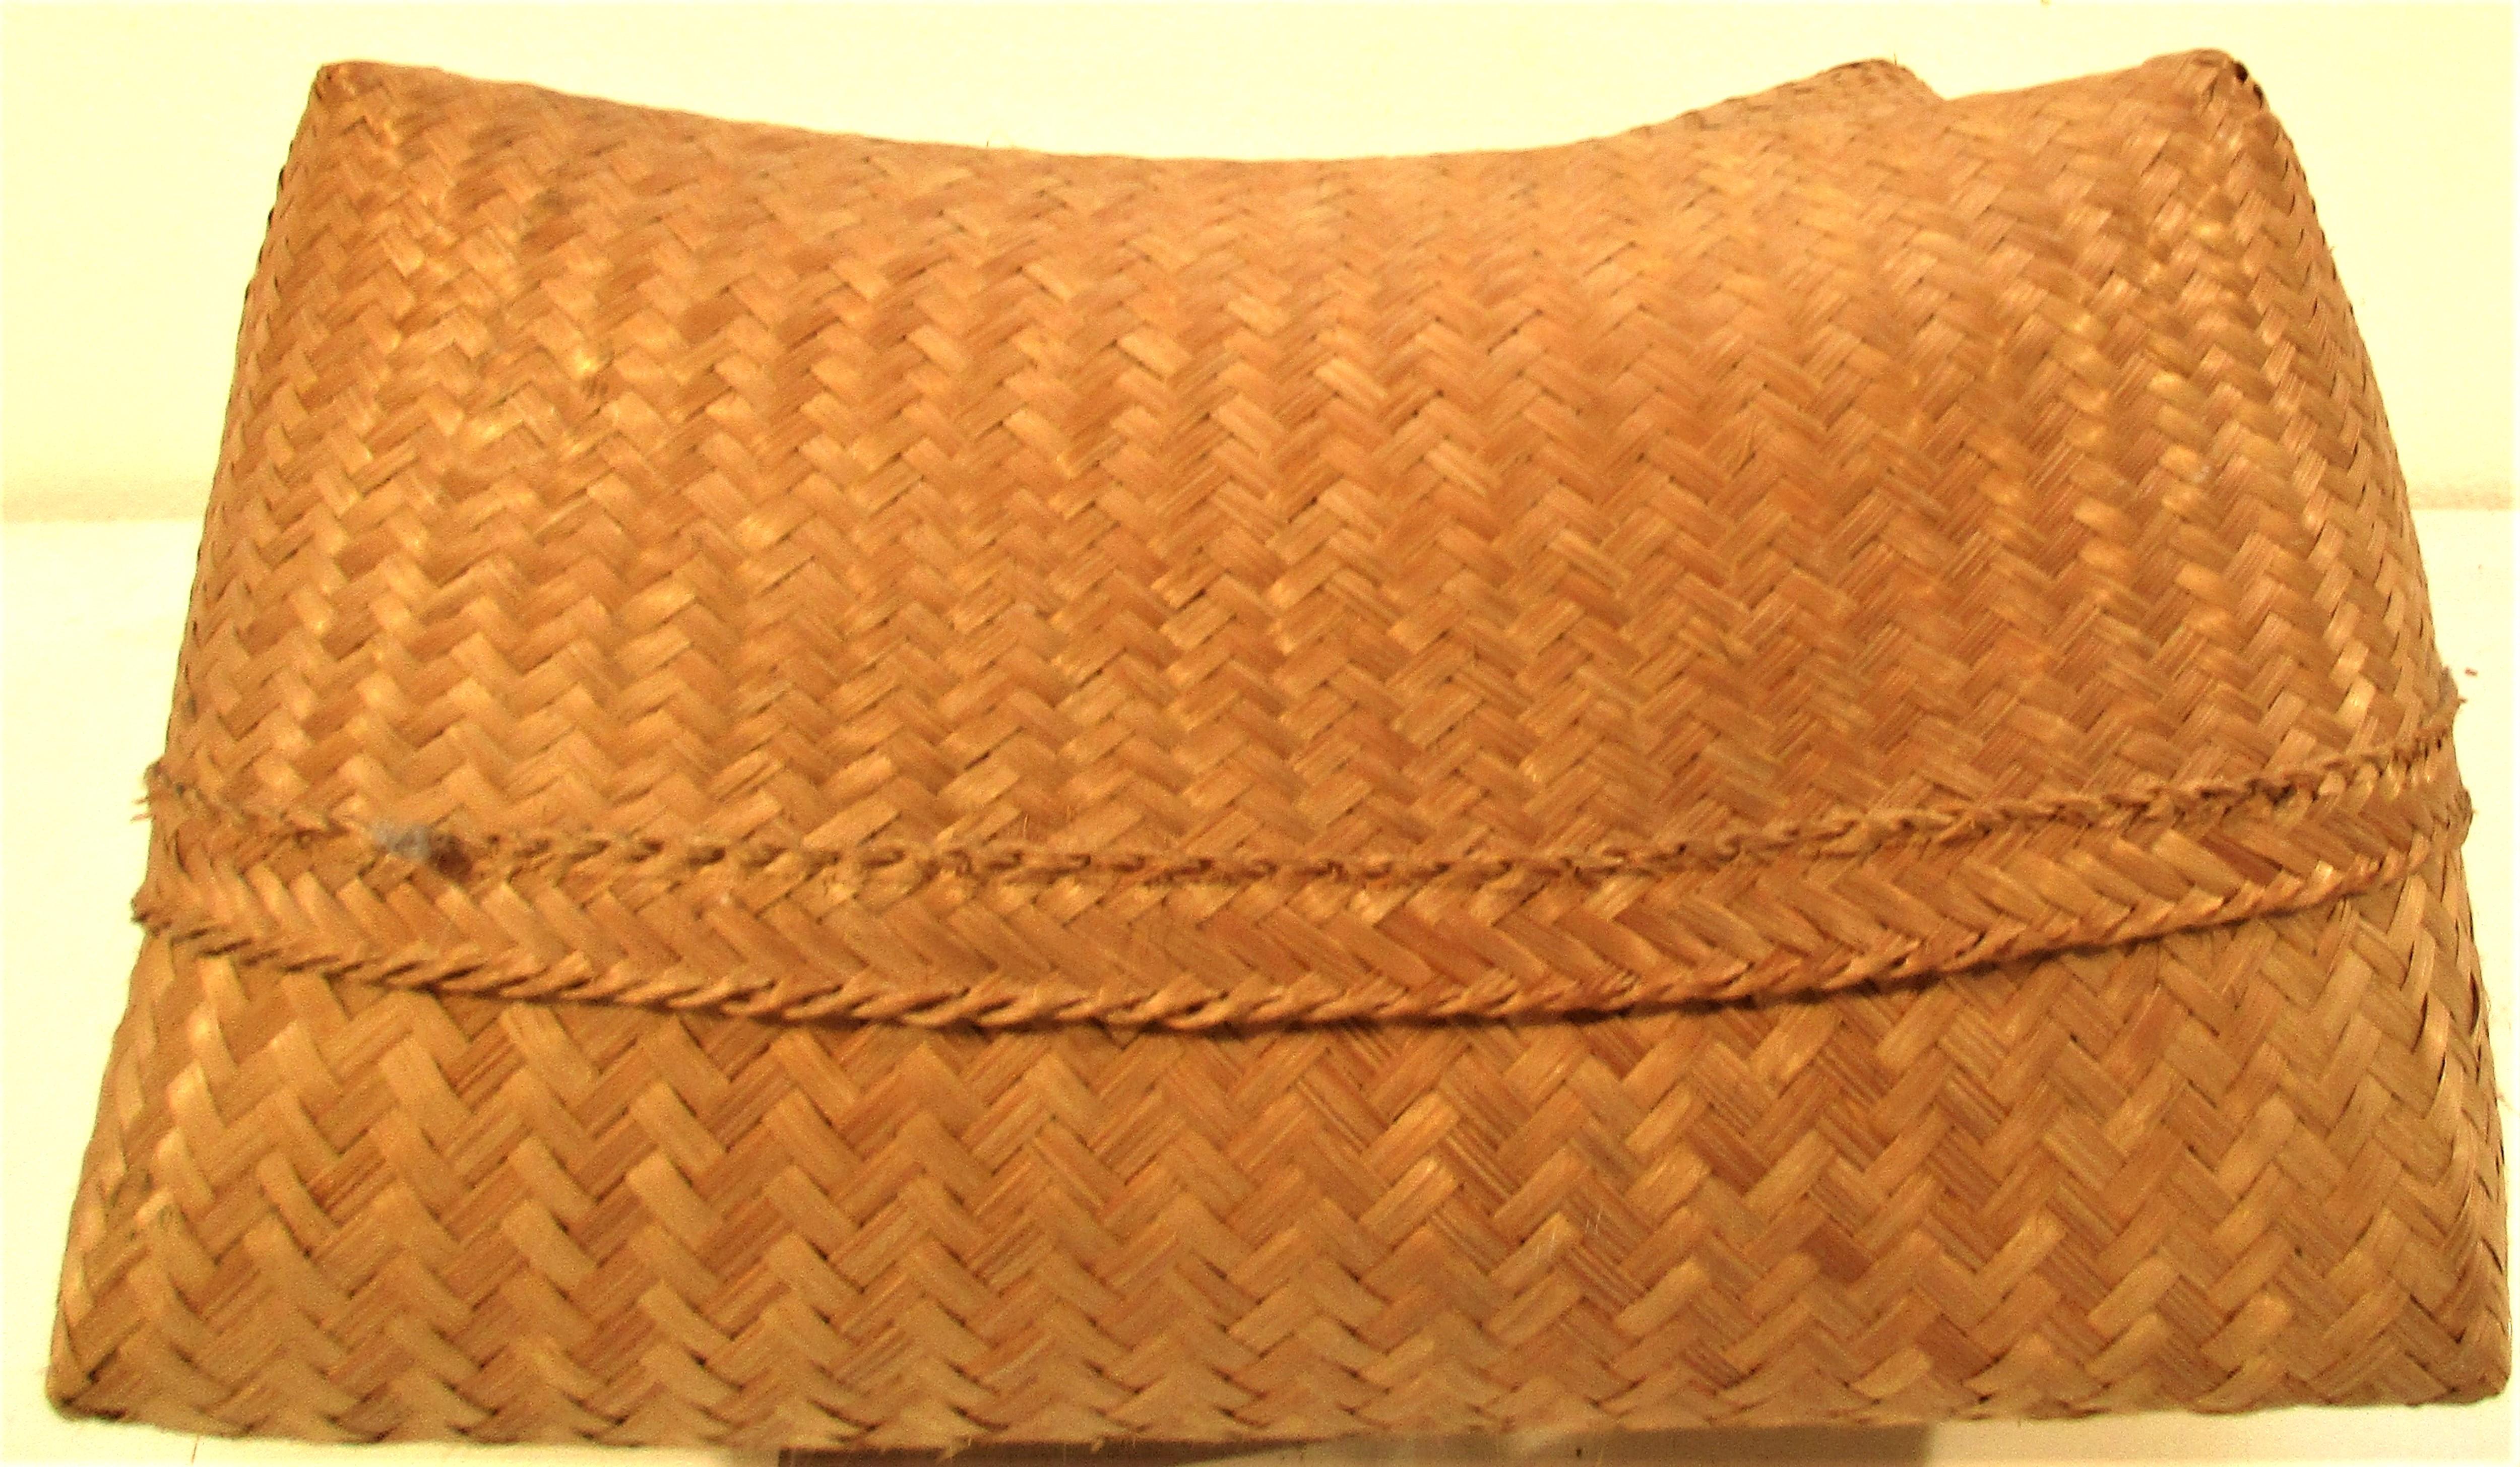 Traditional Lombok rice storage basket with lid. 28 x 28 x 17cm.